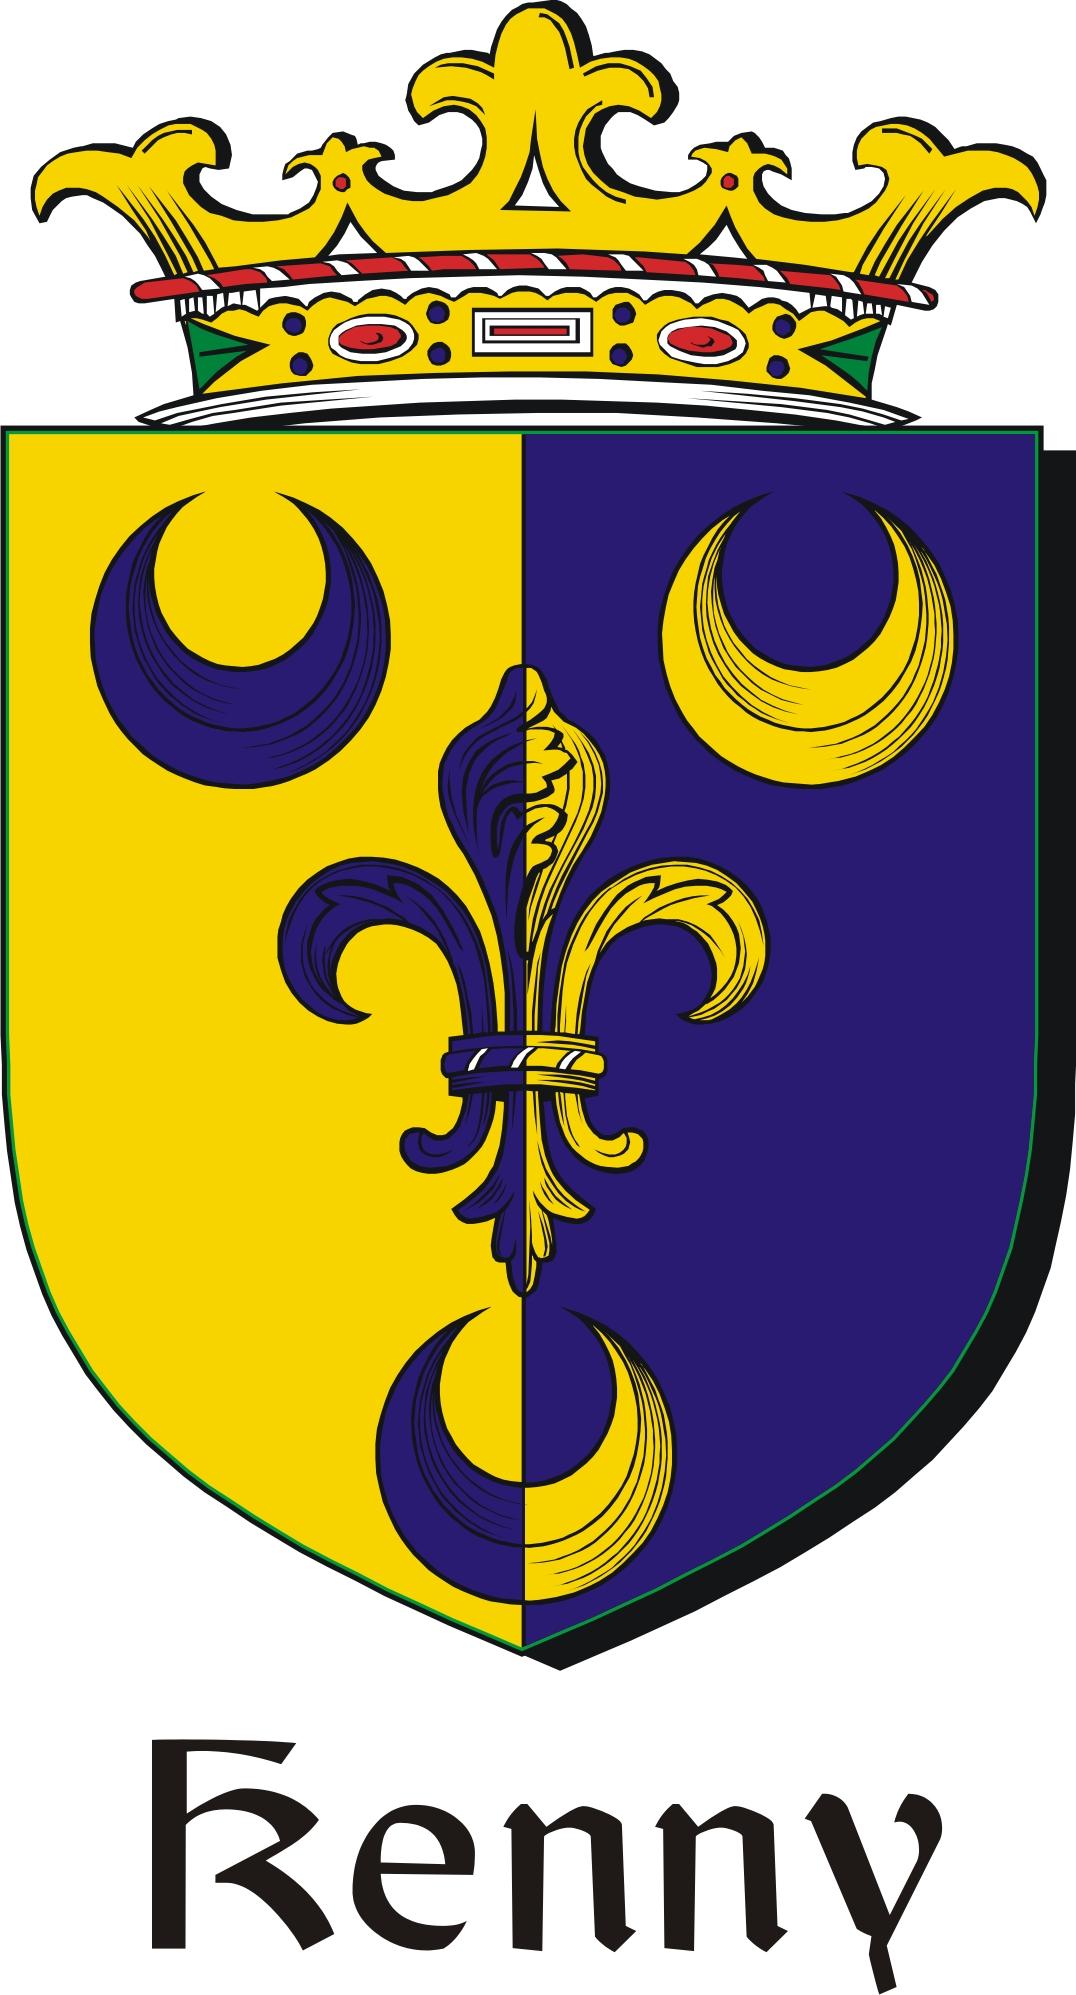 Kenny family crest irish coat of arms image download kennycoat kenny family crest irish coat of arms image download buycottarizona Images